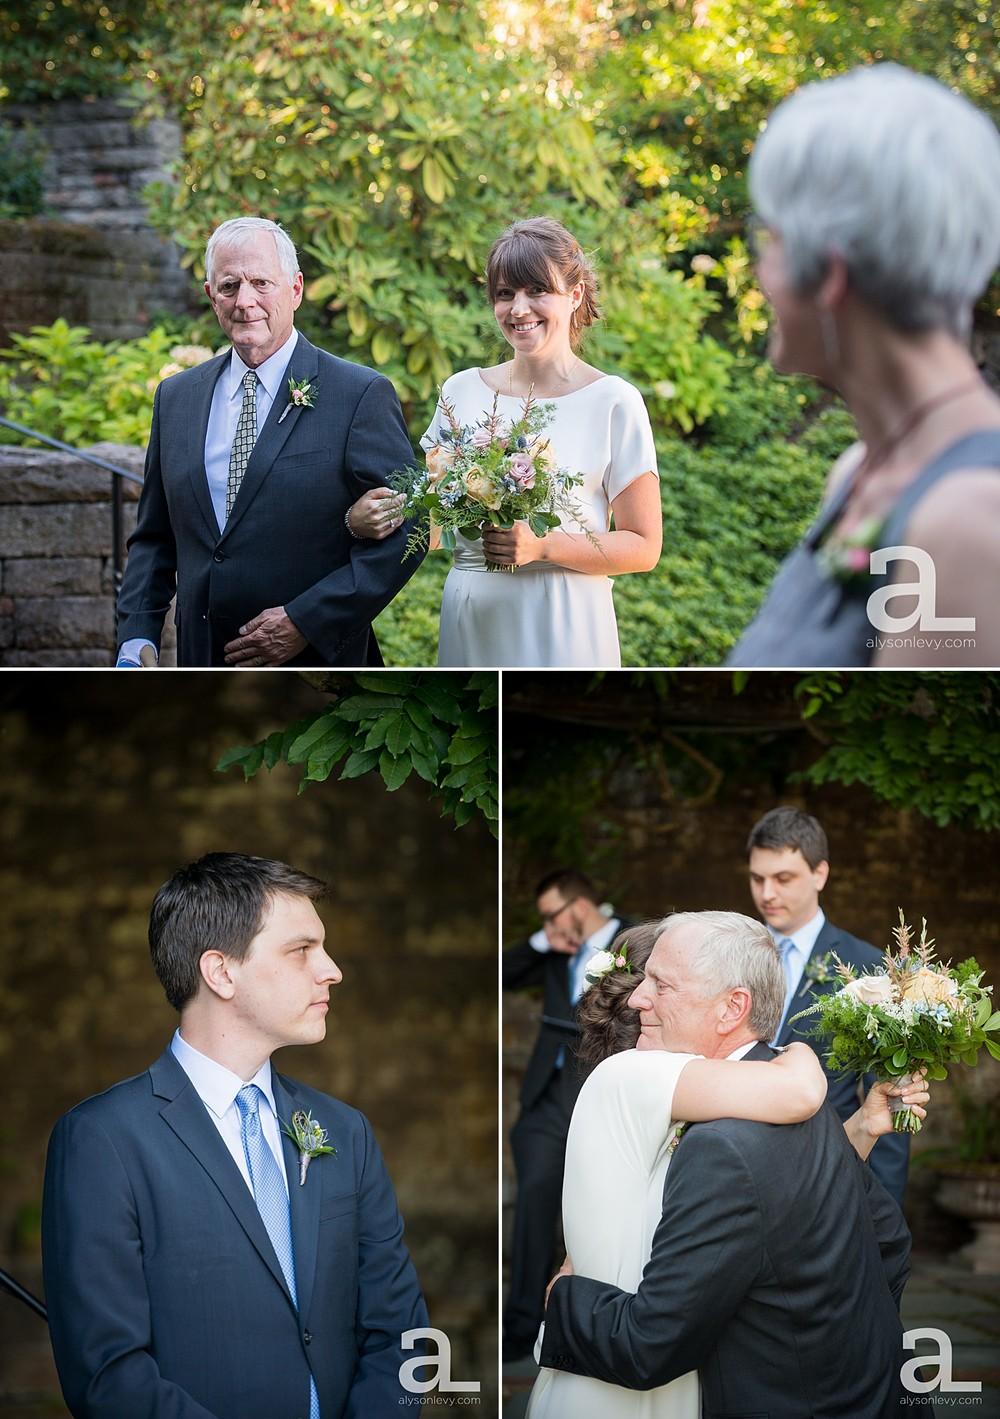 Lewis-Clark-Estate-Gardens-Portland-Wedding-Photography_0010.jpg